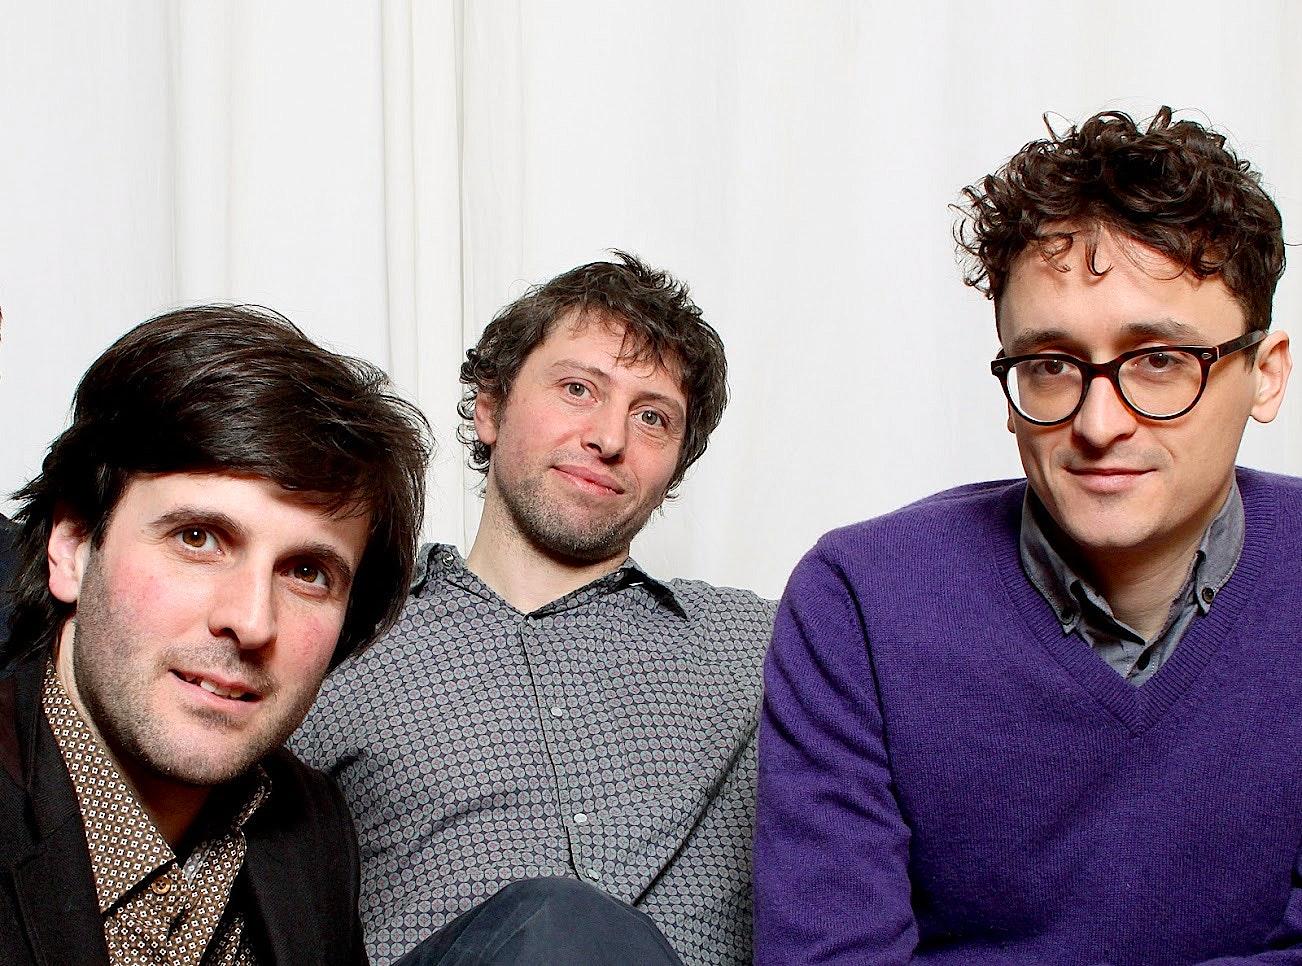 Gordon Beeferman & Celano/Badenhorst/Baggiani trio